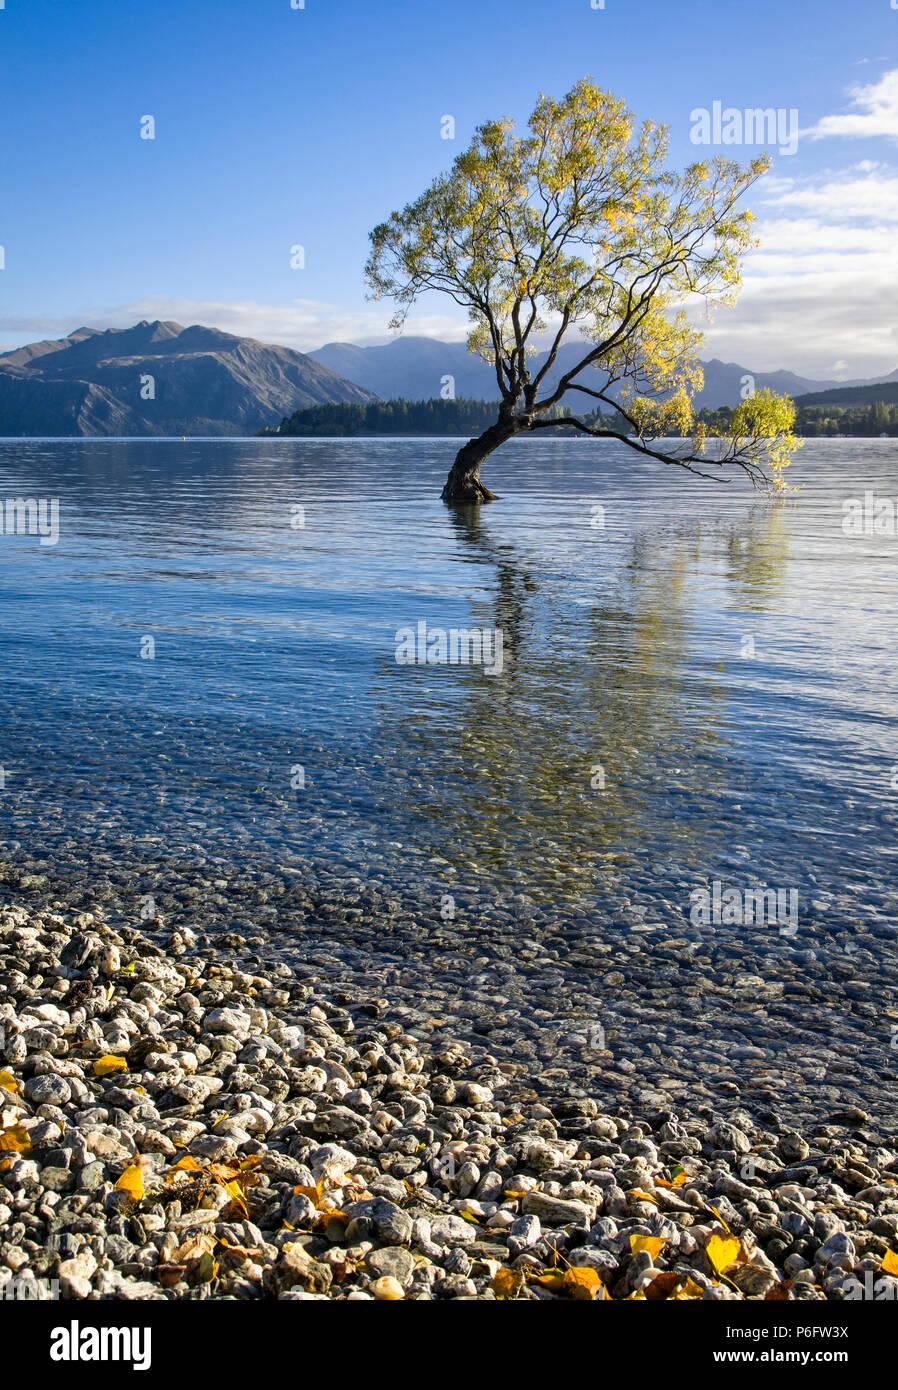 The lone tree on Lake Wanaka, South Island, New Zealand. - Stock Image